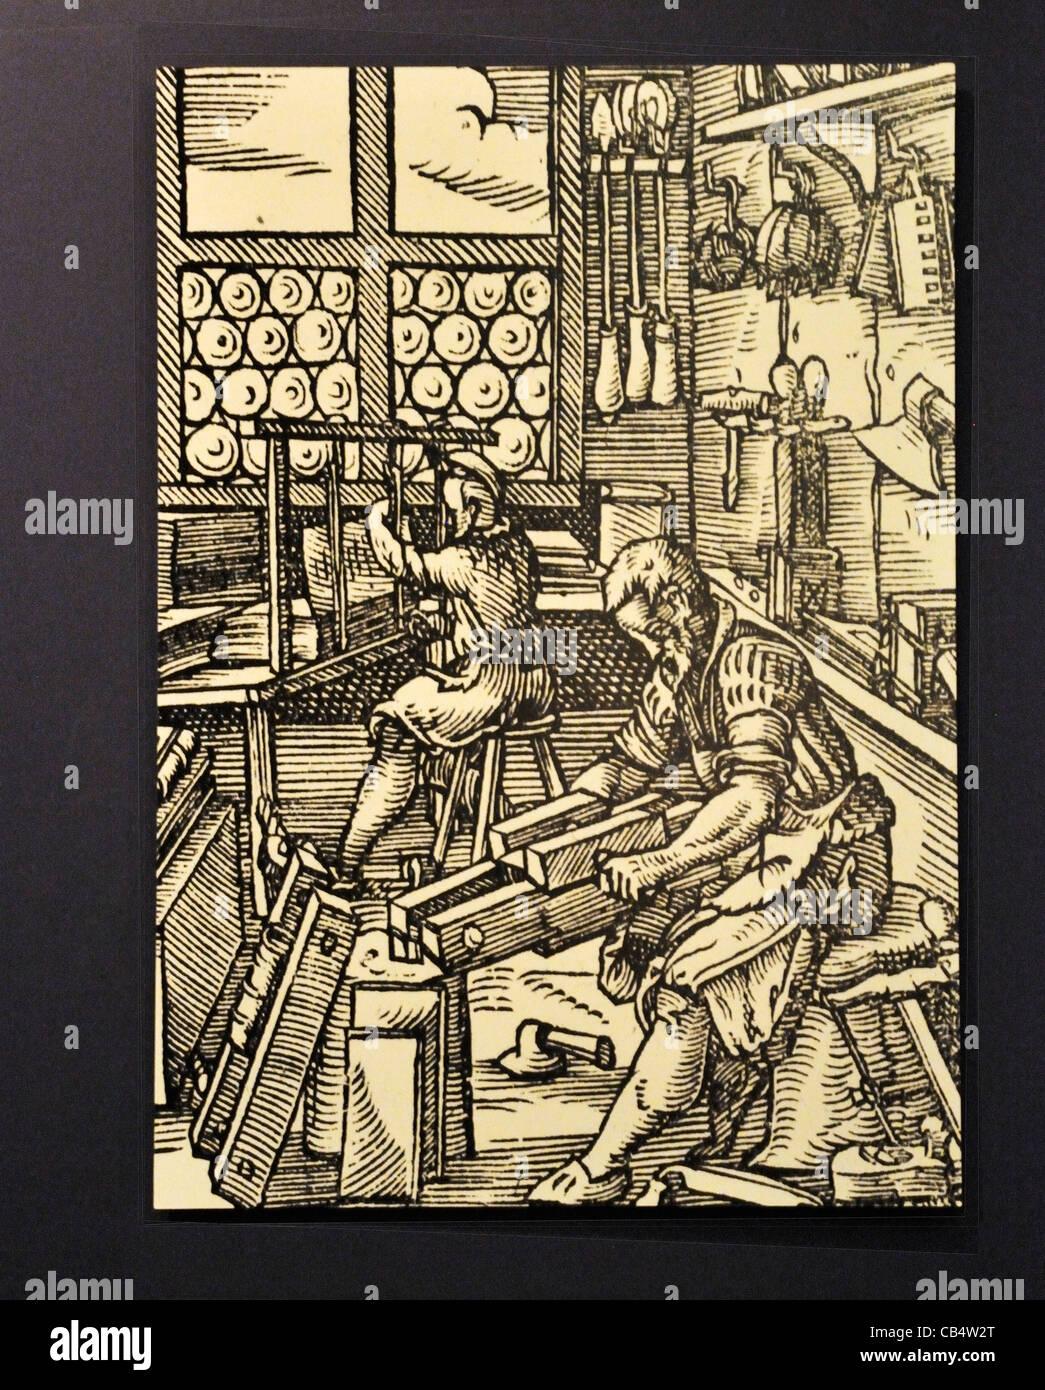 A woodcut on display in the Huntington Library, Pasadena, California - Stock Image